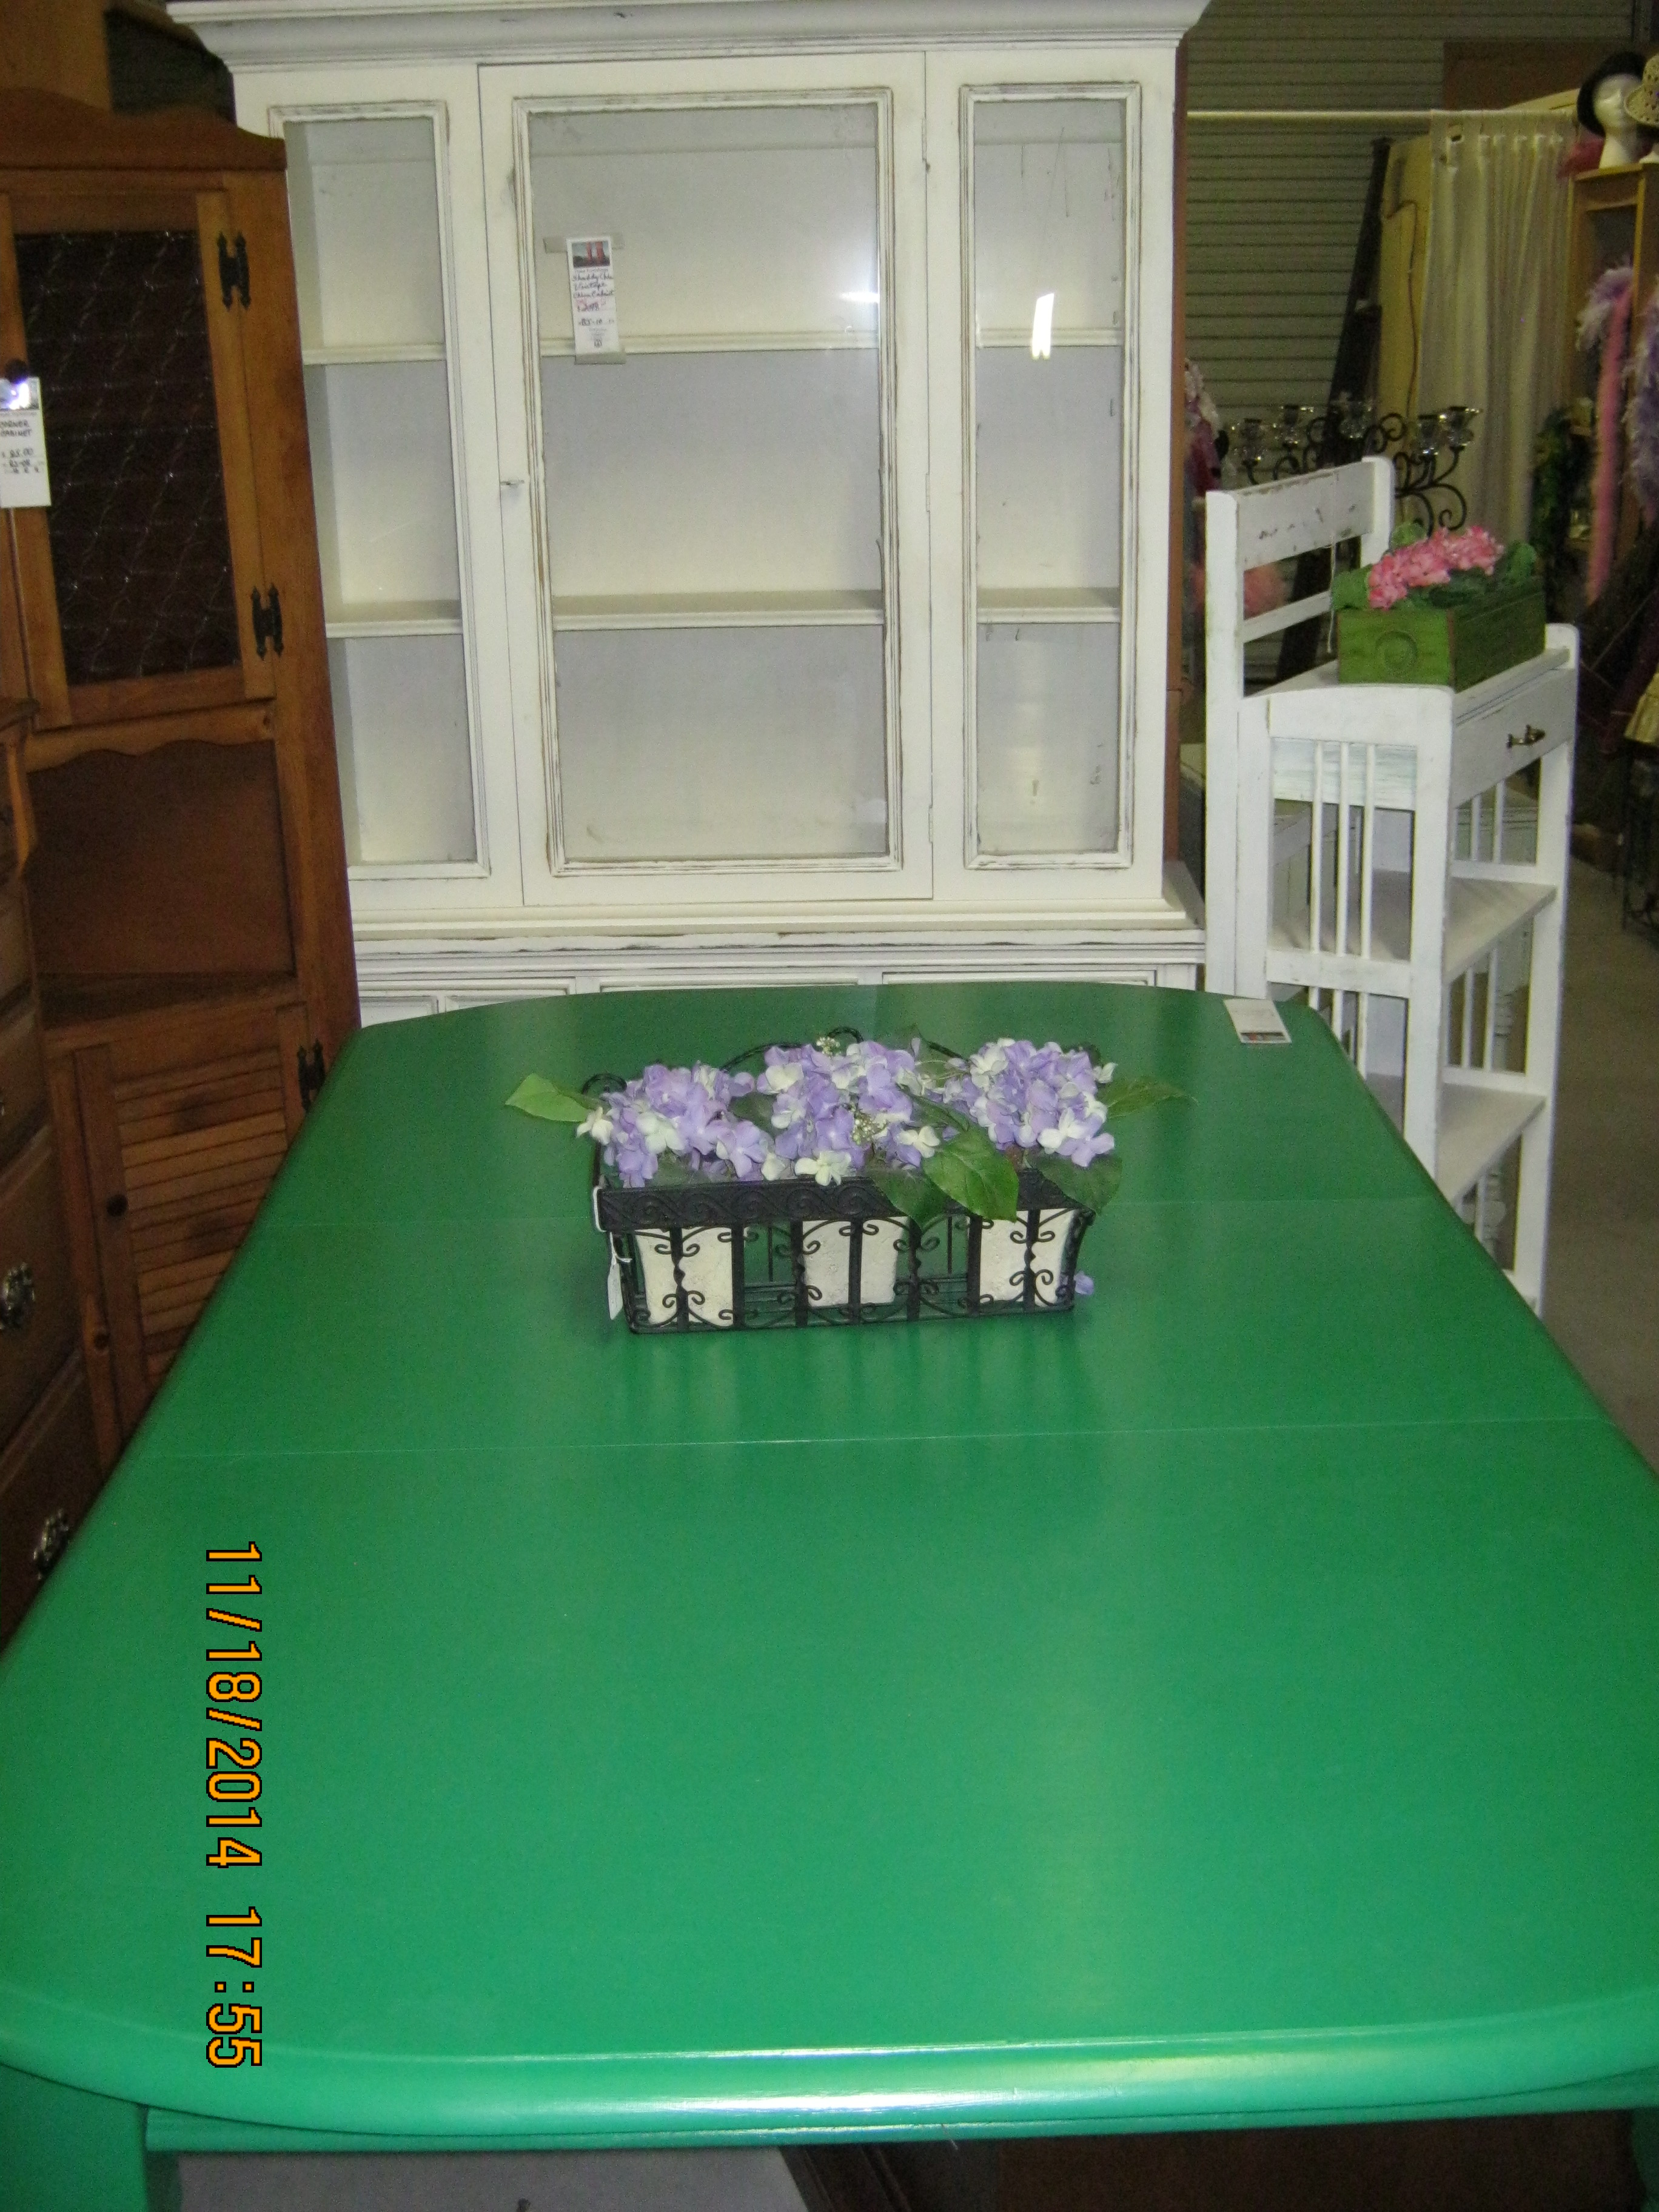 BJ-10 Shabby Cabinet MR-63 Green table